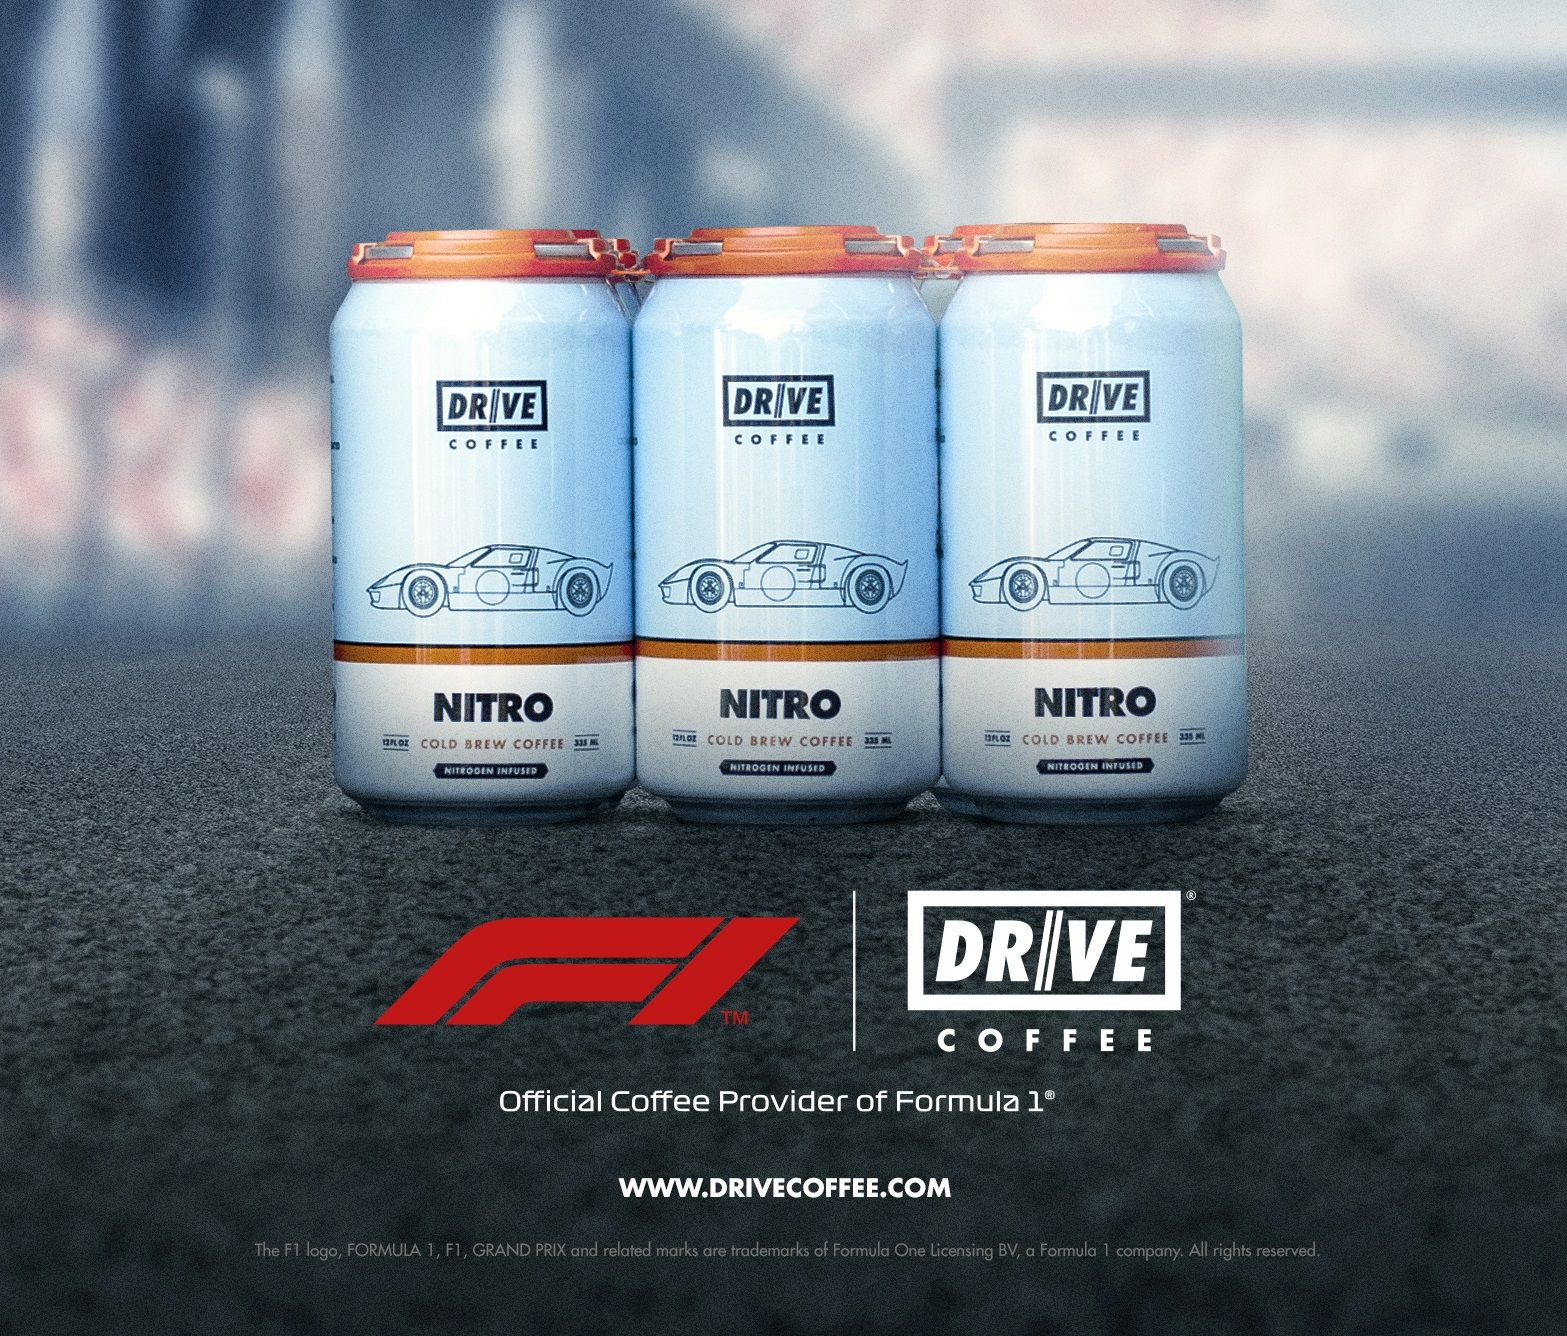 F1, Drive, Coffee